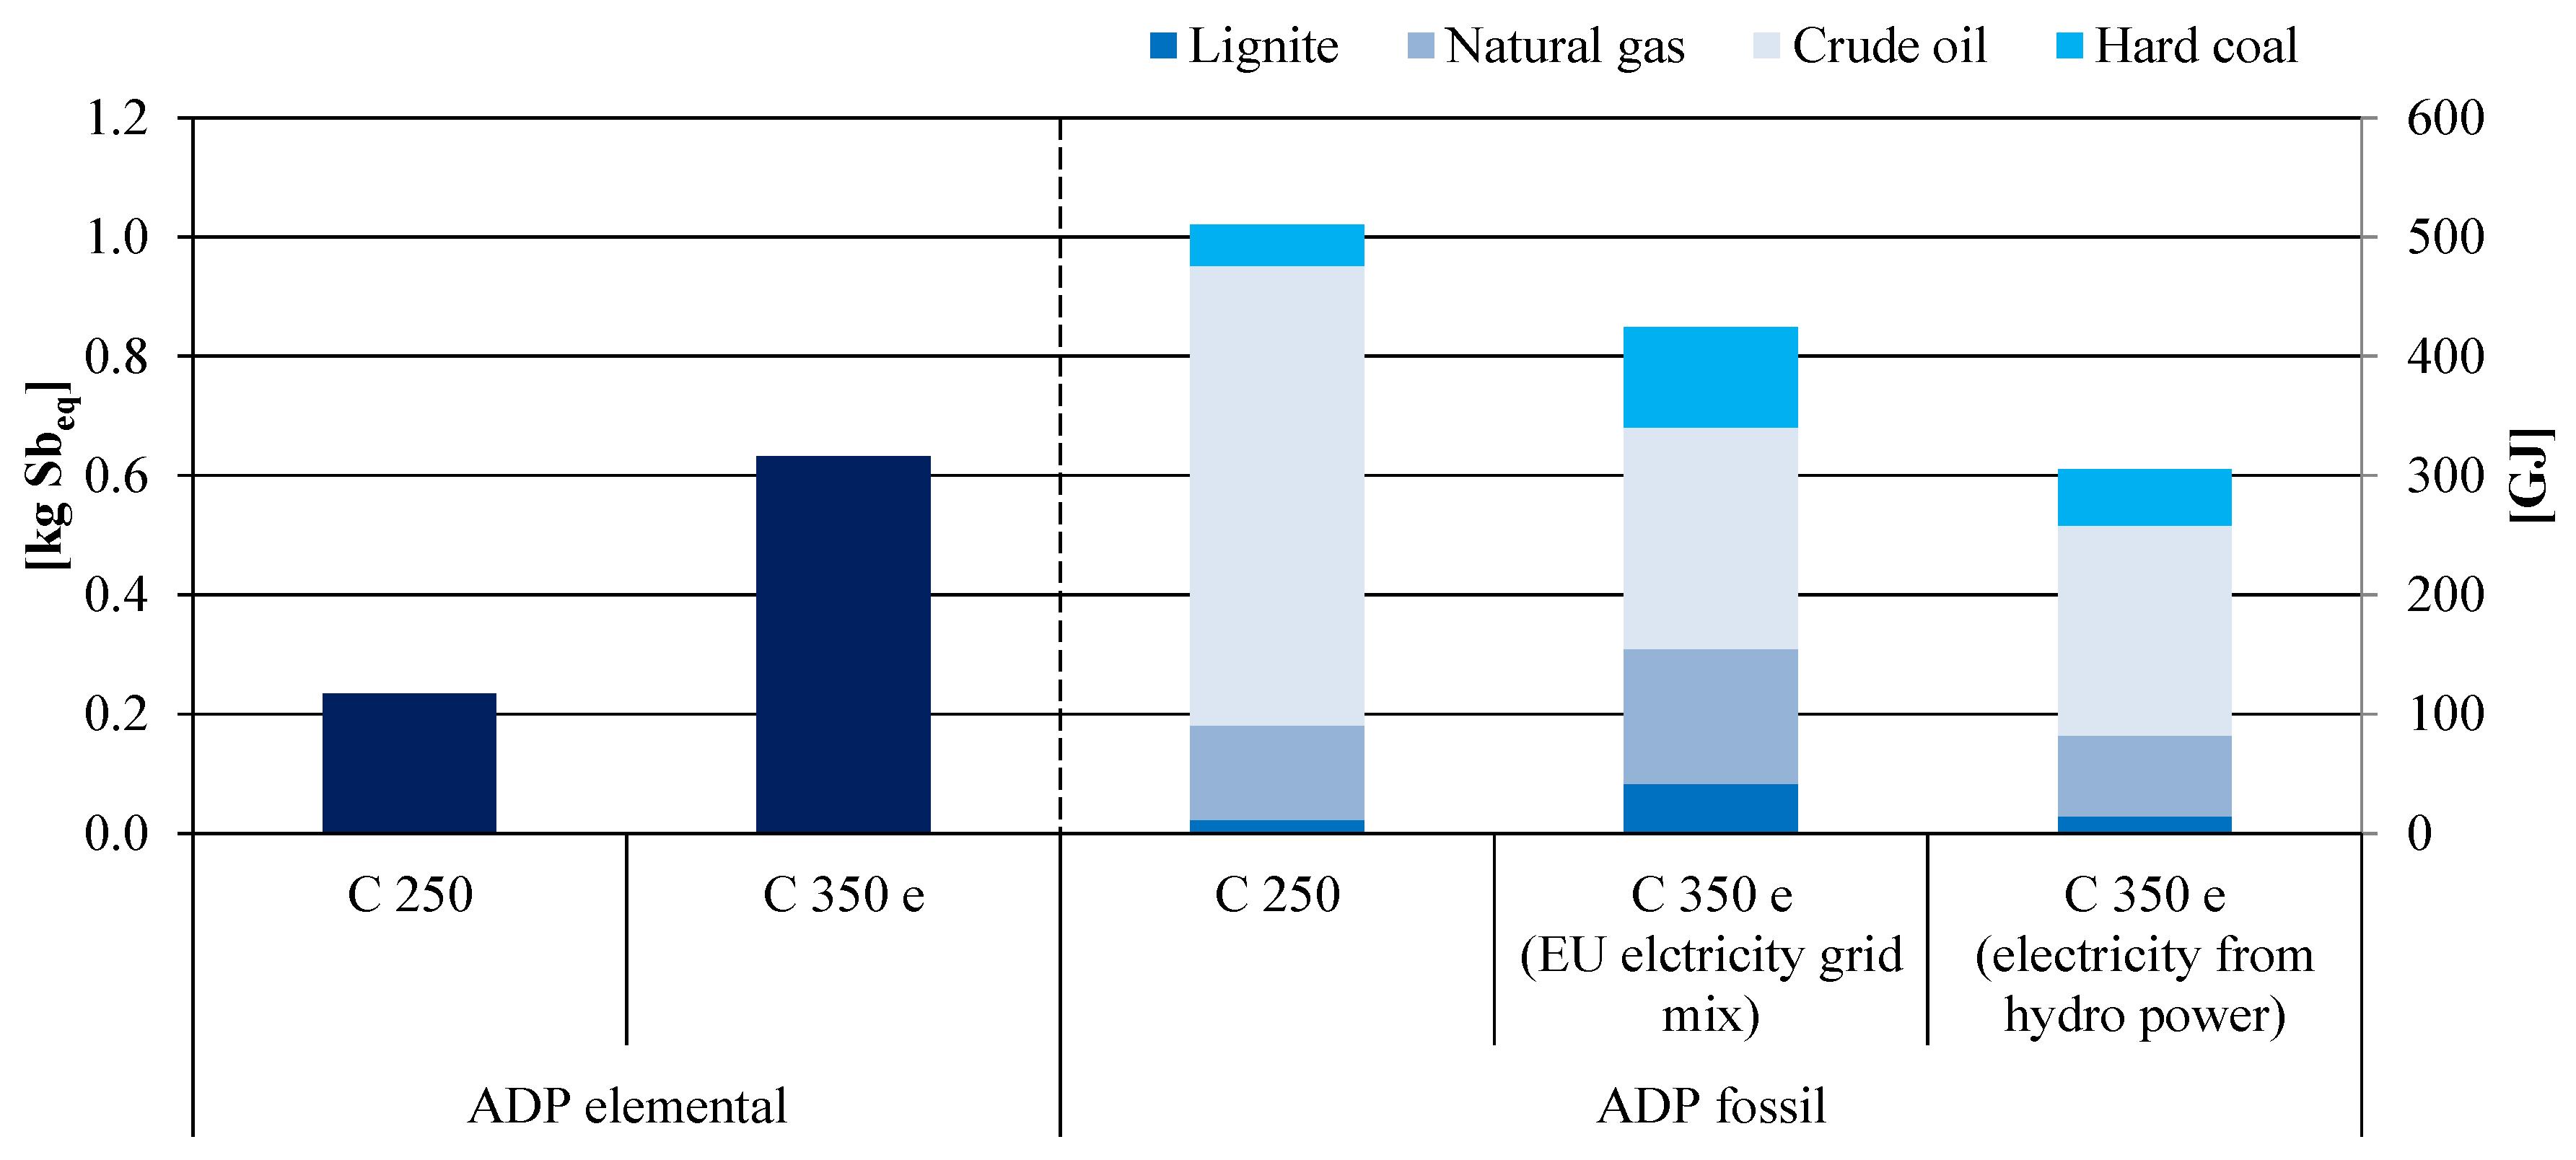 Snap Internal Combustion Engine Temperatures Gas Wiring Diagram 350 Schemes